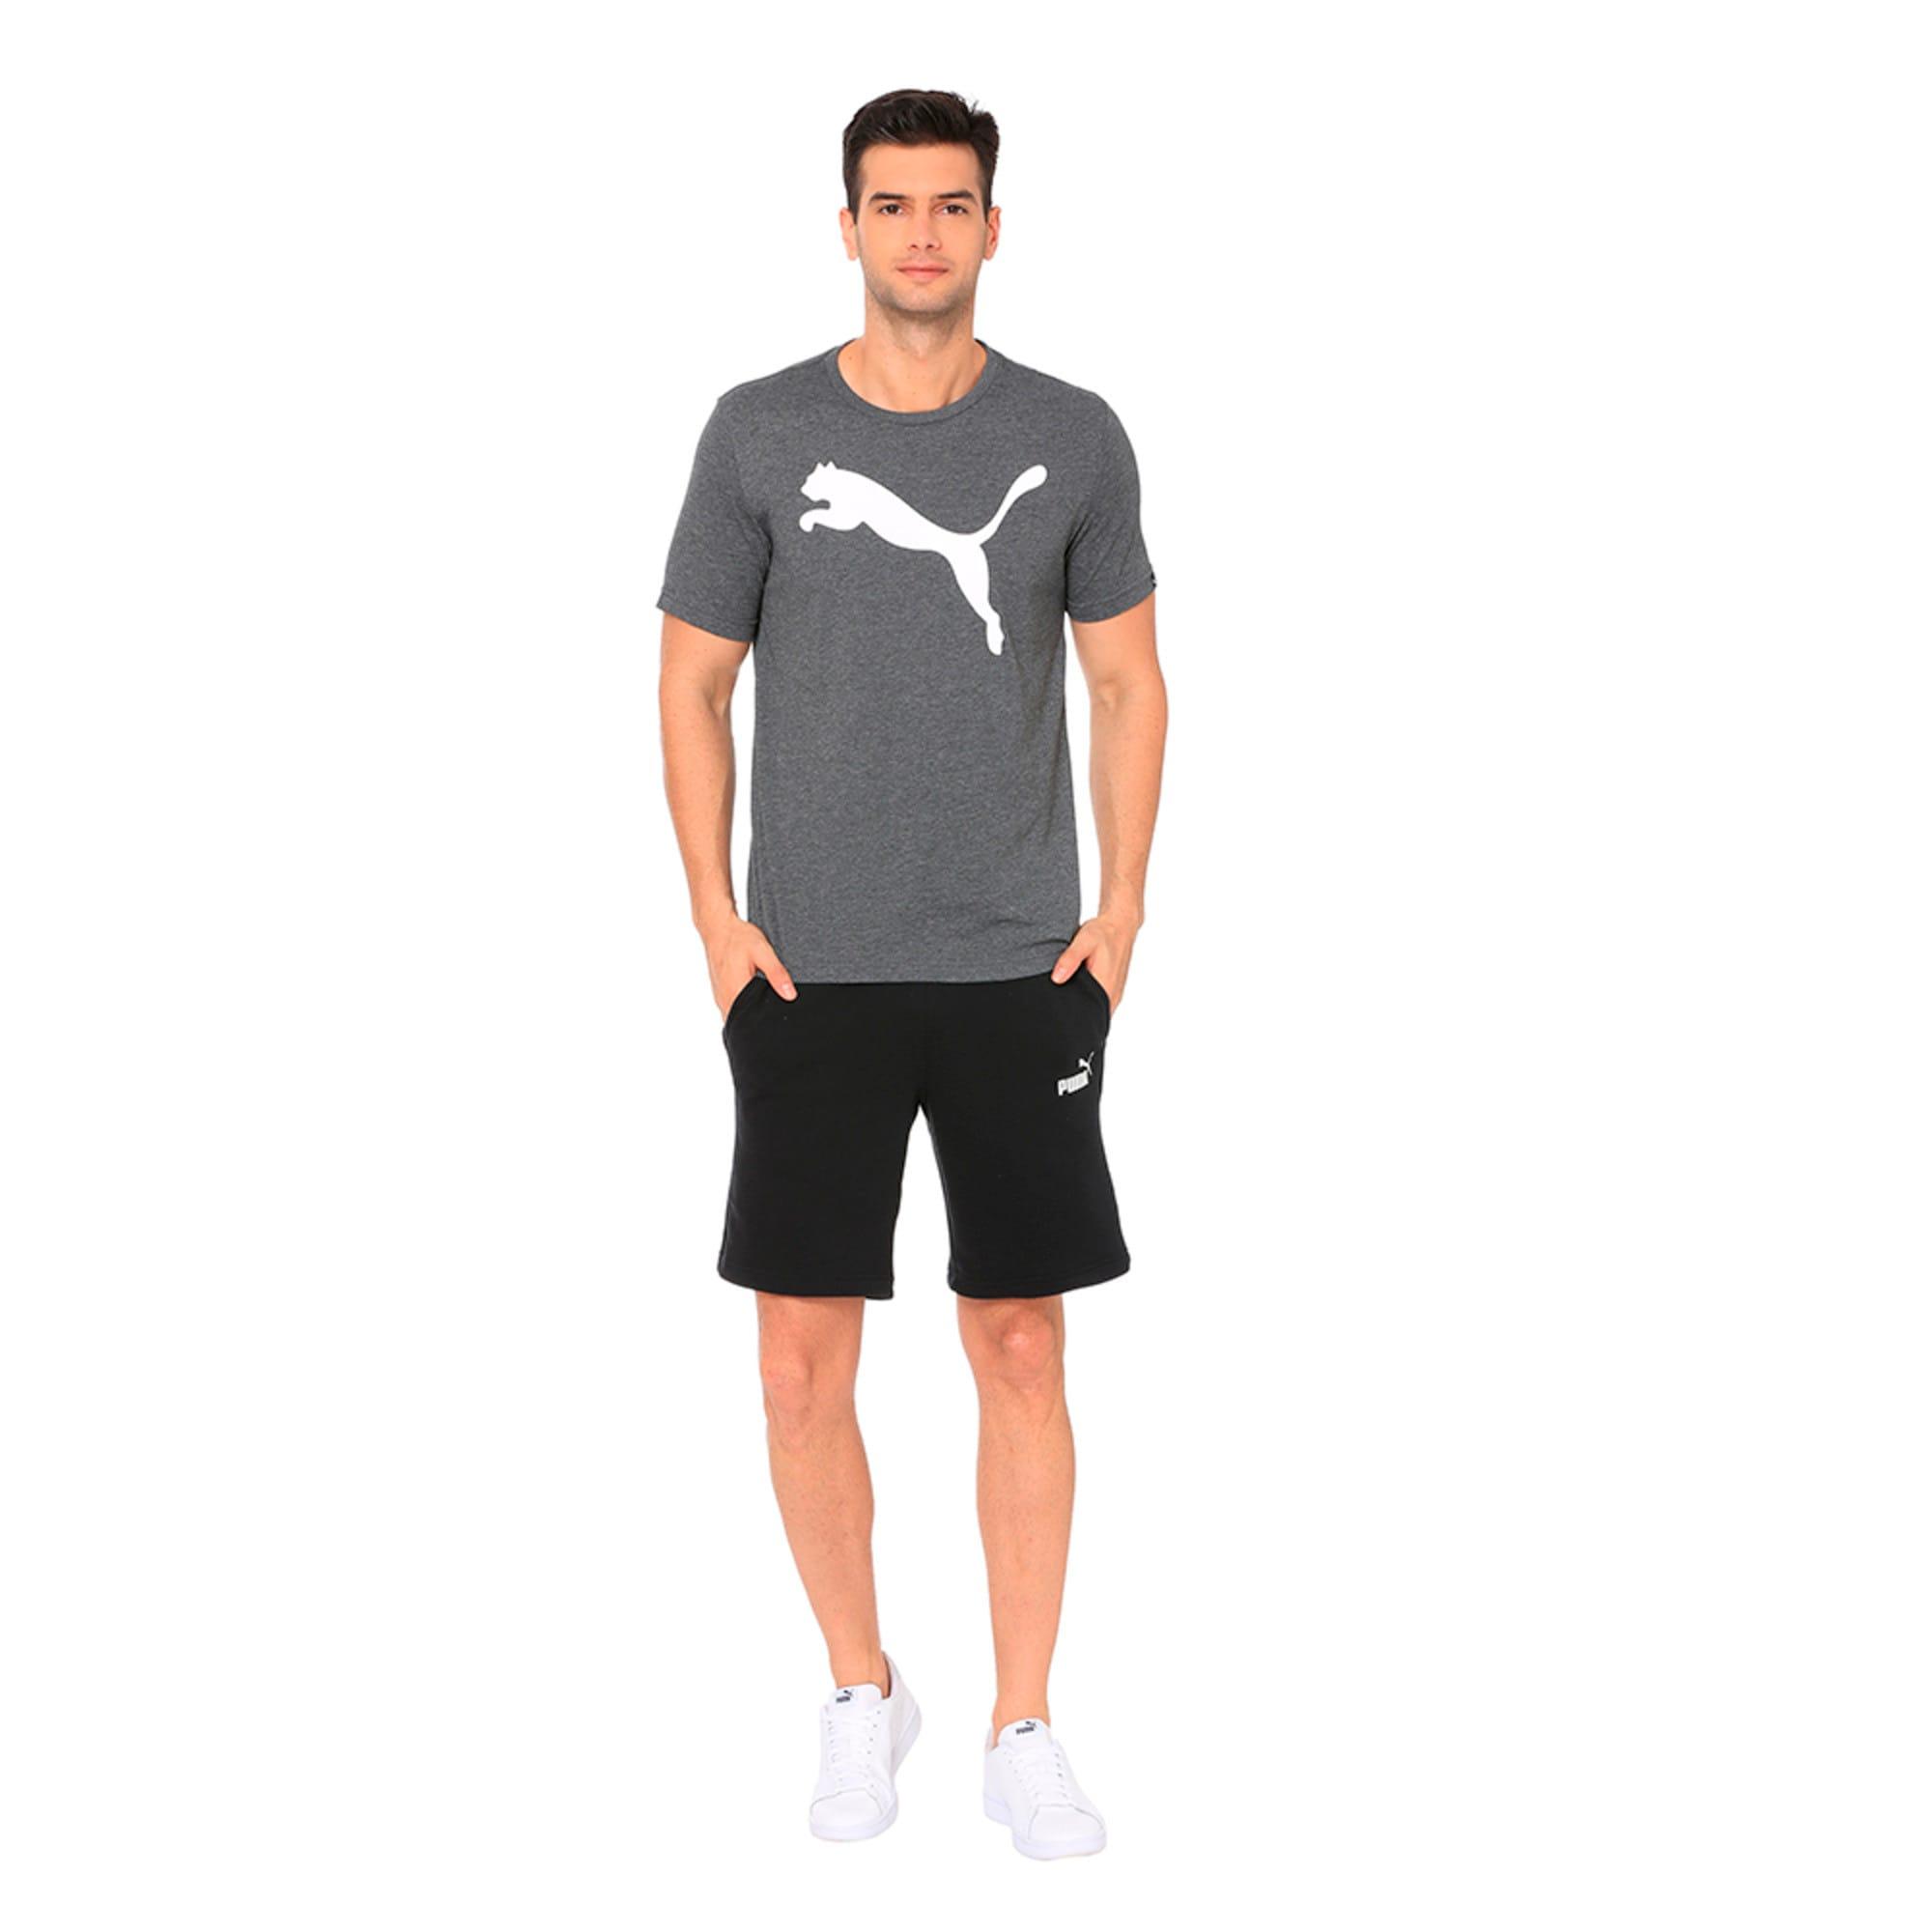 Thumbnail 3 of Men's Big Cat Heather T-Shirt, Puma Black Heather, medium-IND